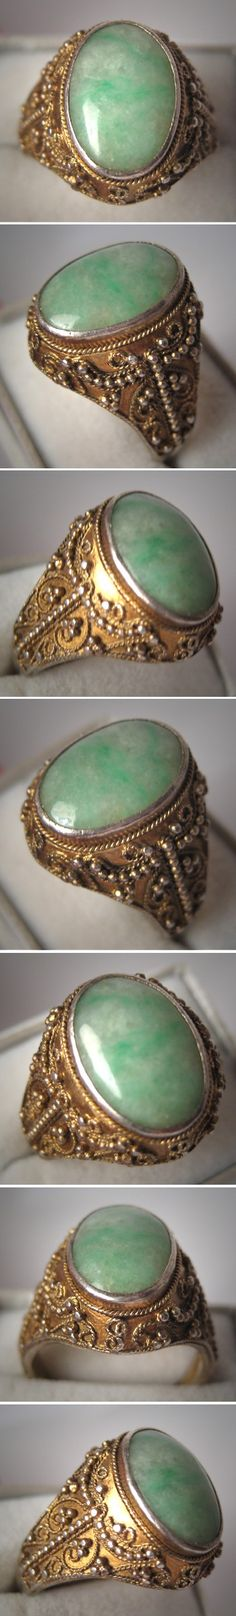 Antique Jade Ring Vintage Etruscan Gold Gilt Jewelry - Wedding